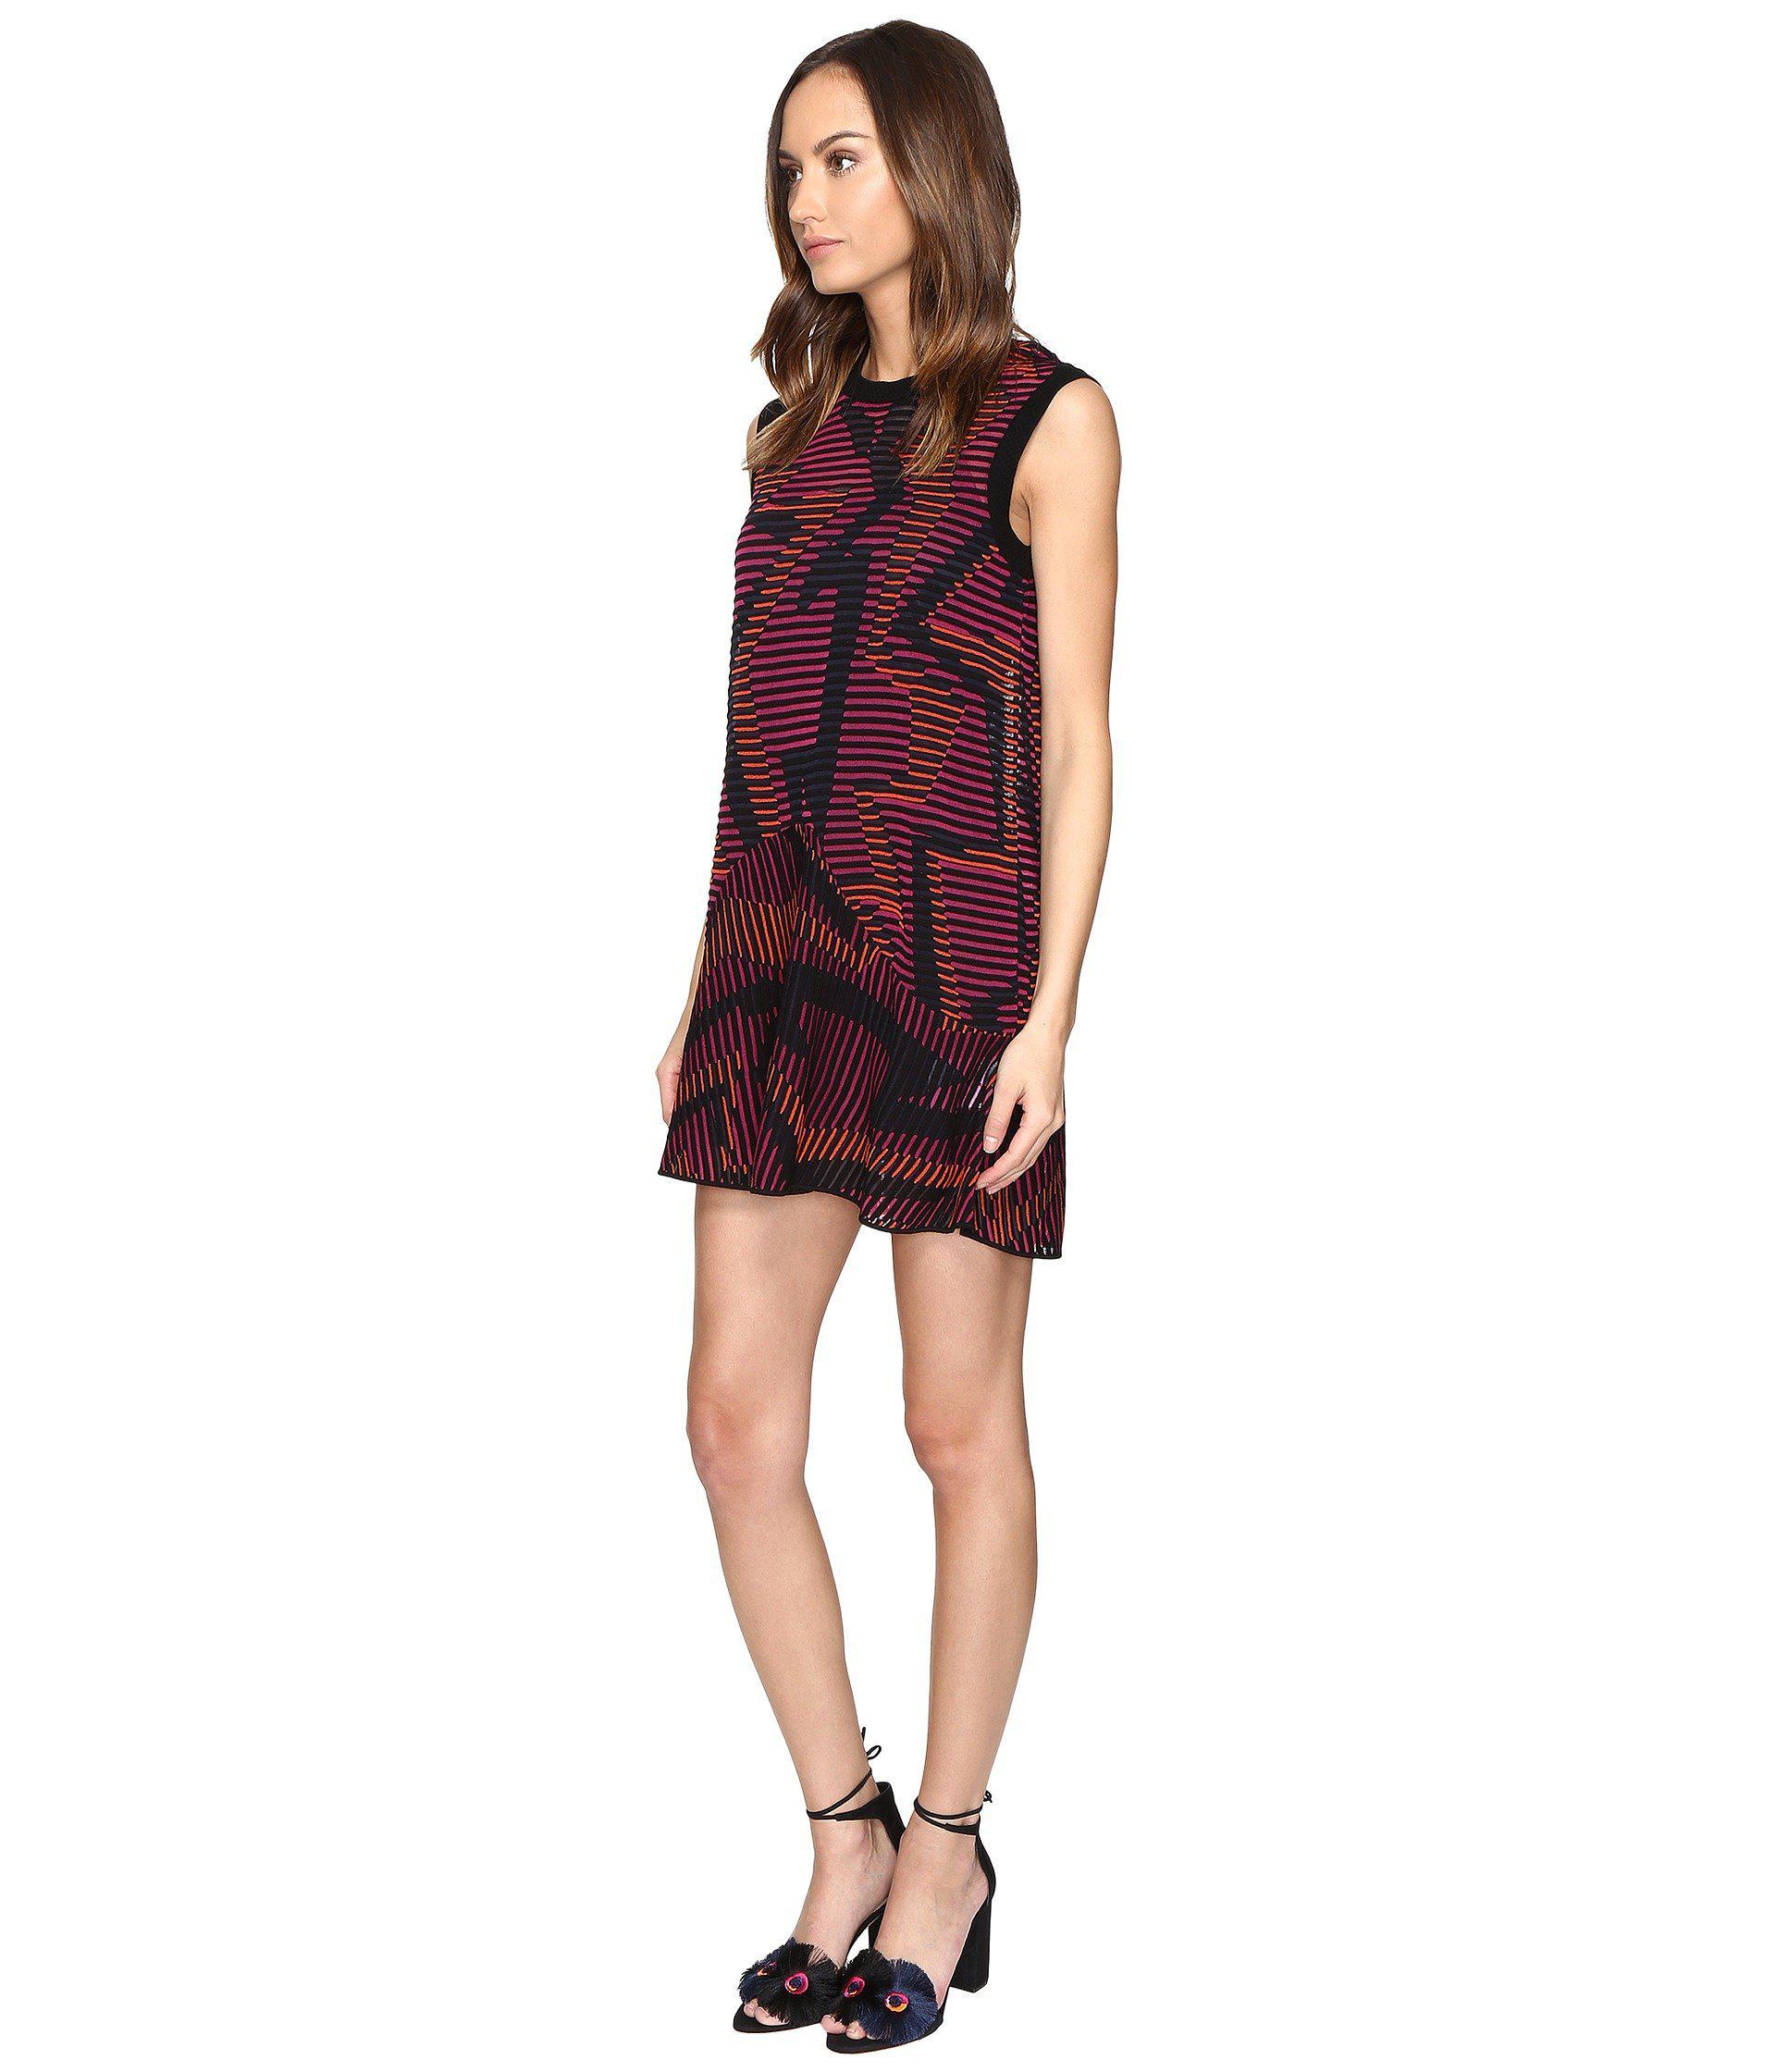 e8ec71216c81 Lyst - M Missoni Colorful Geo Knit Dress in Red - Save 20%